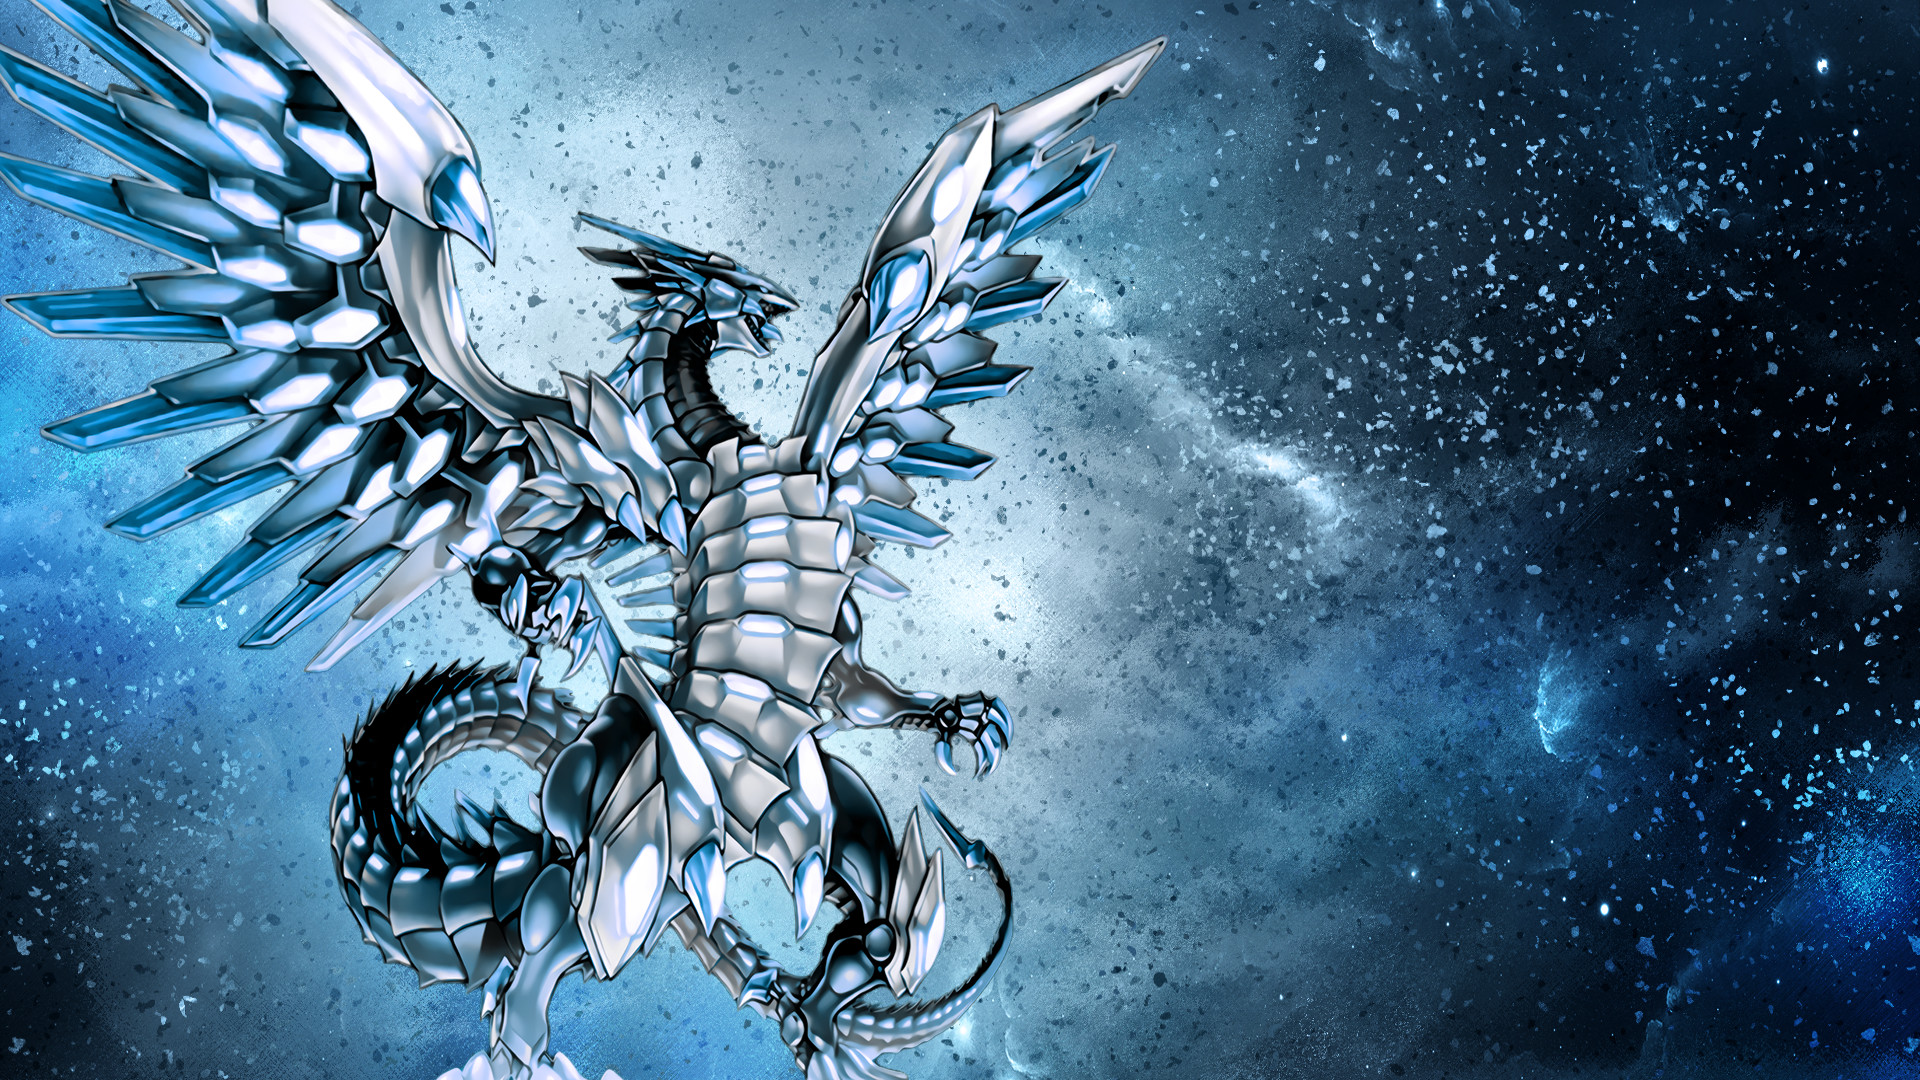 Black Dragon Wallpaper Blue Eyes Chaos Max Dragon 1248889